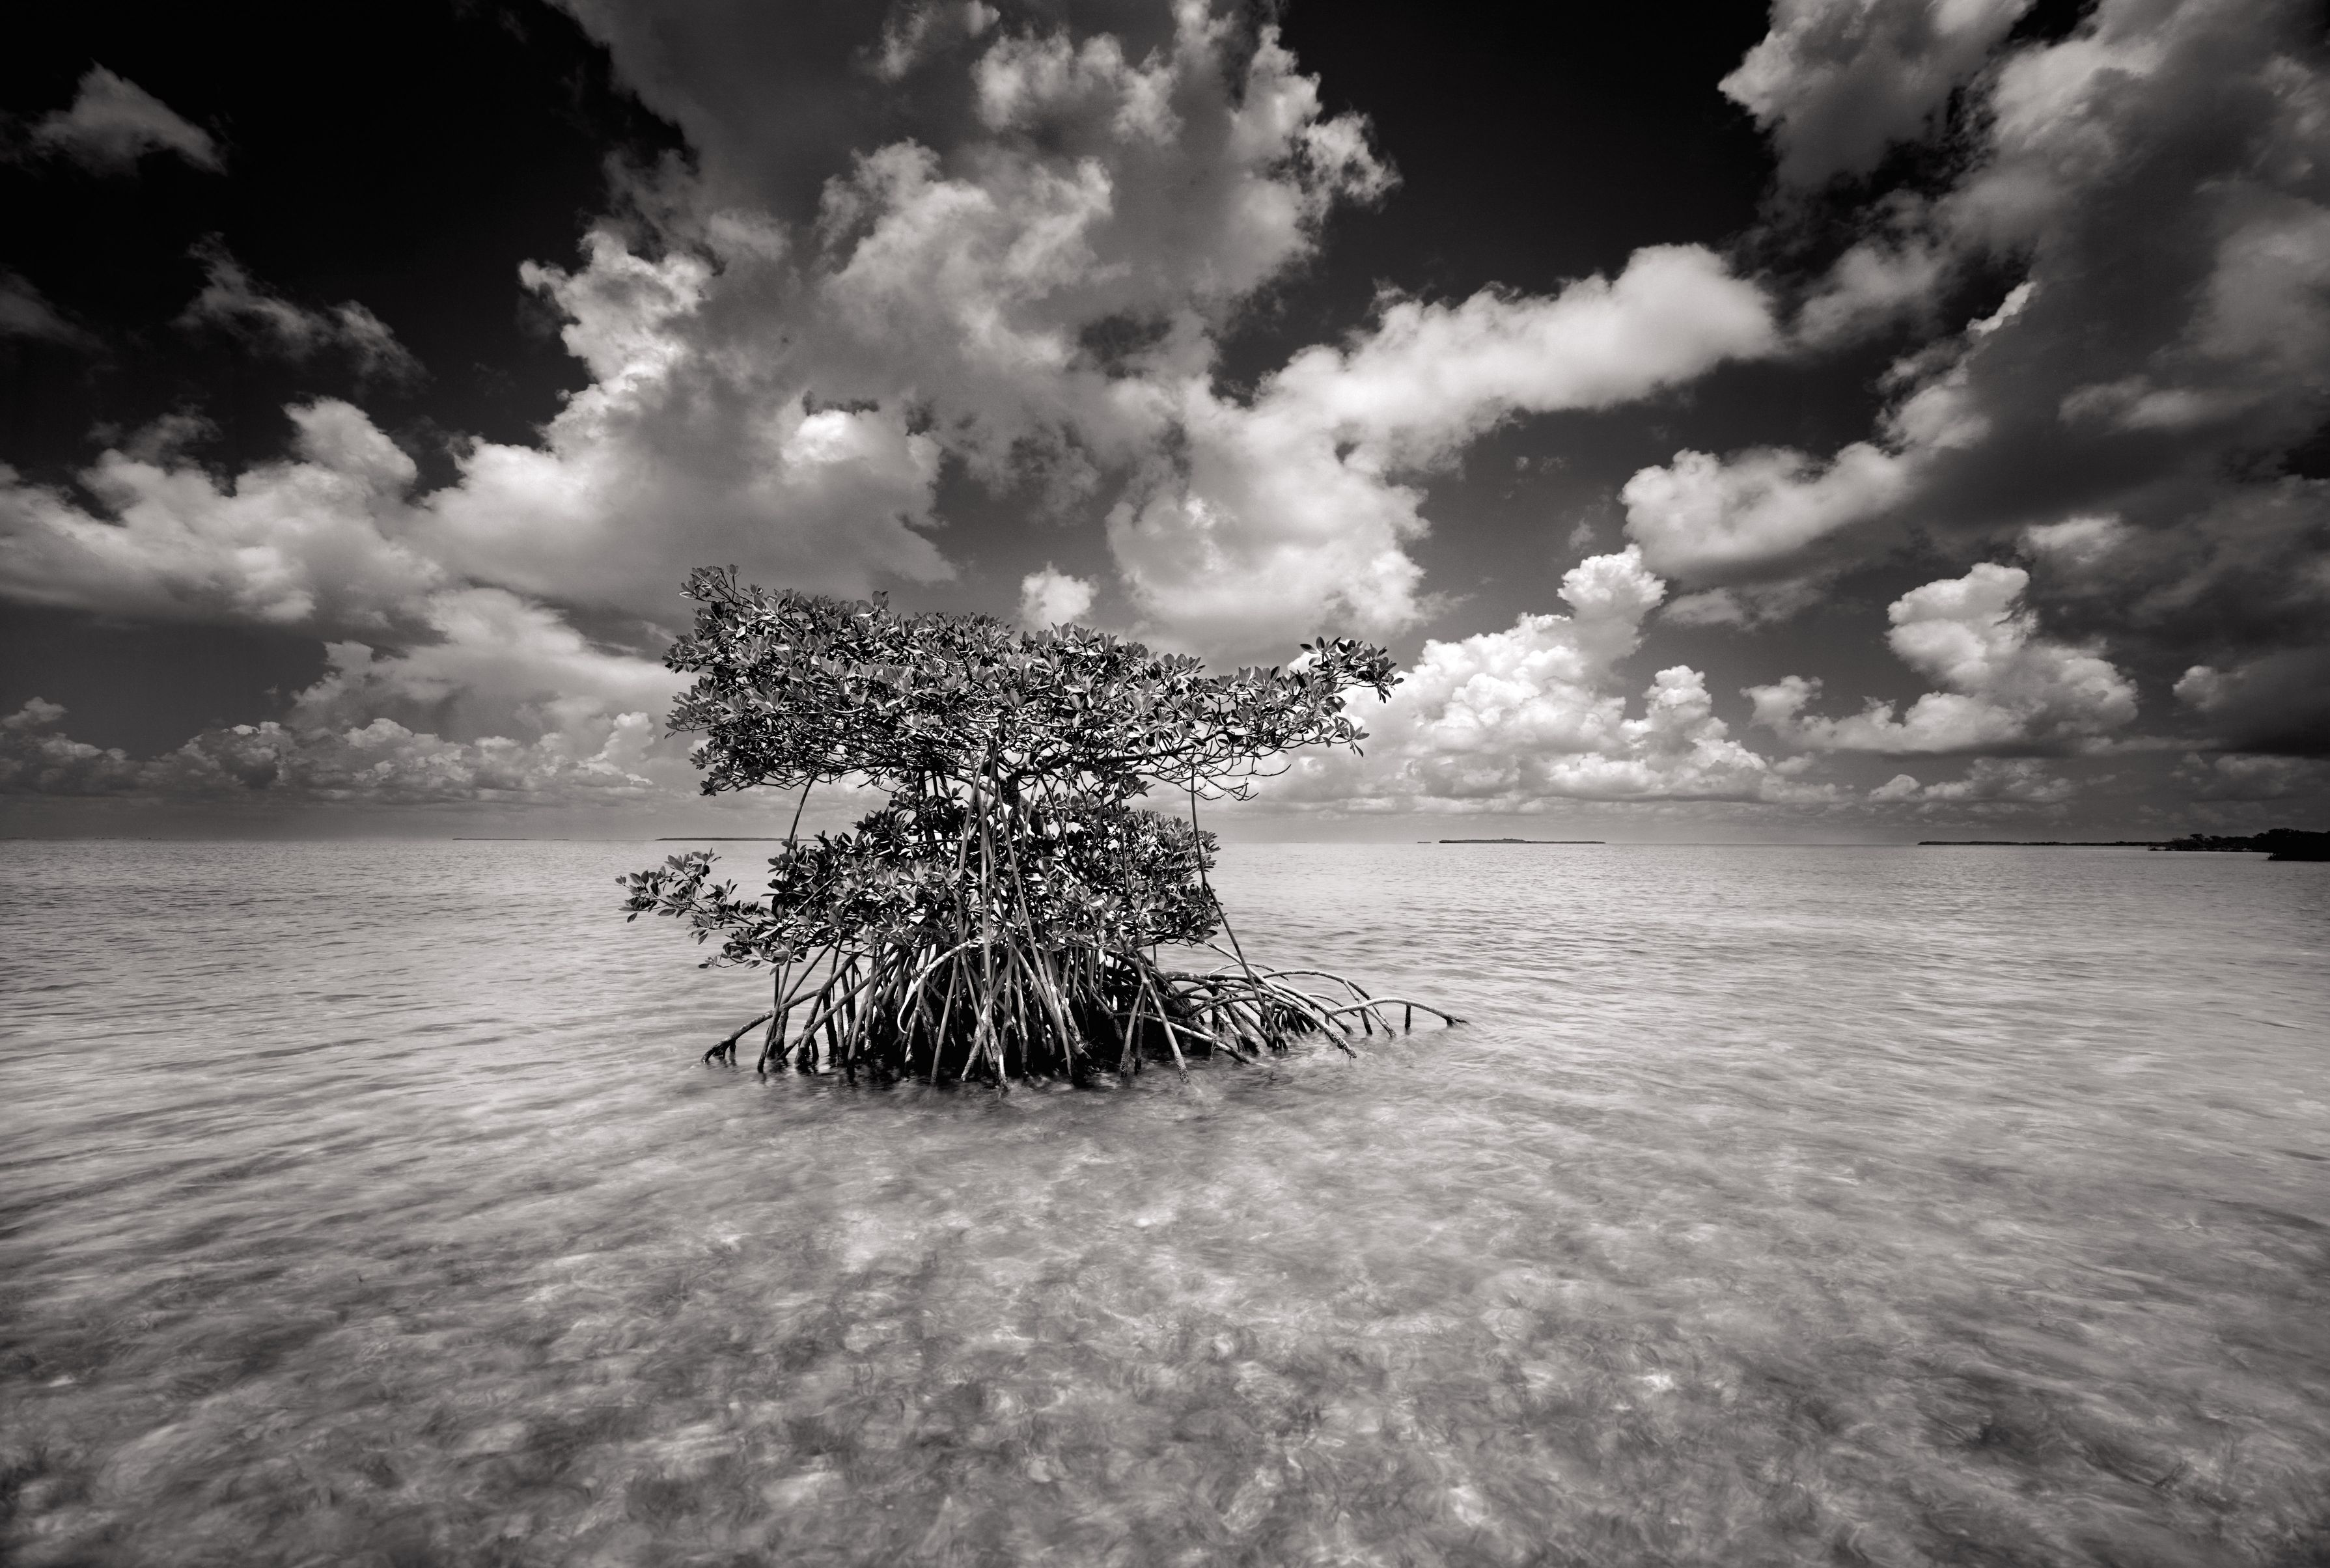 America's Everglades